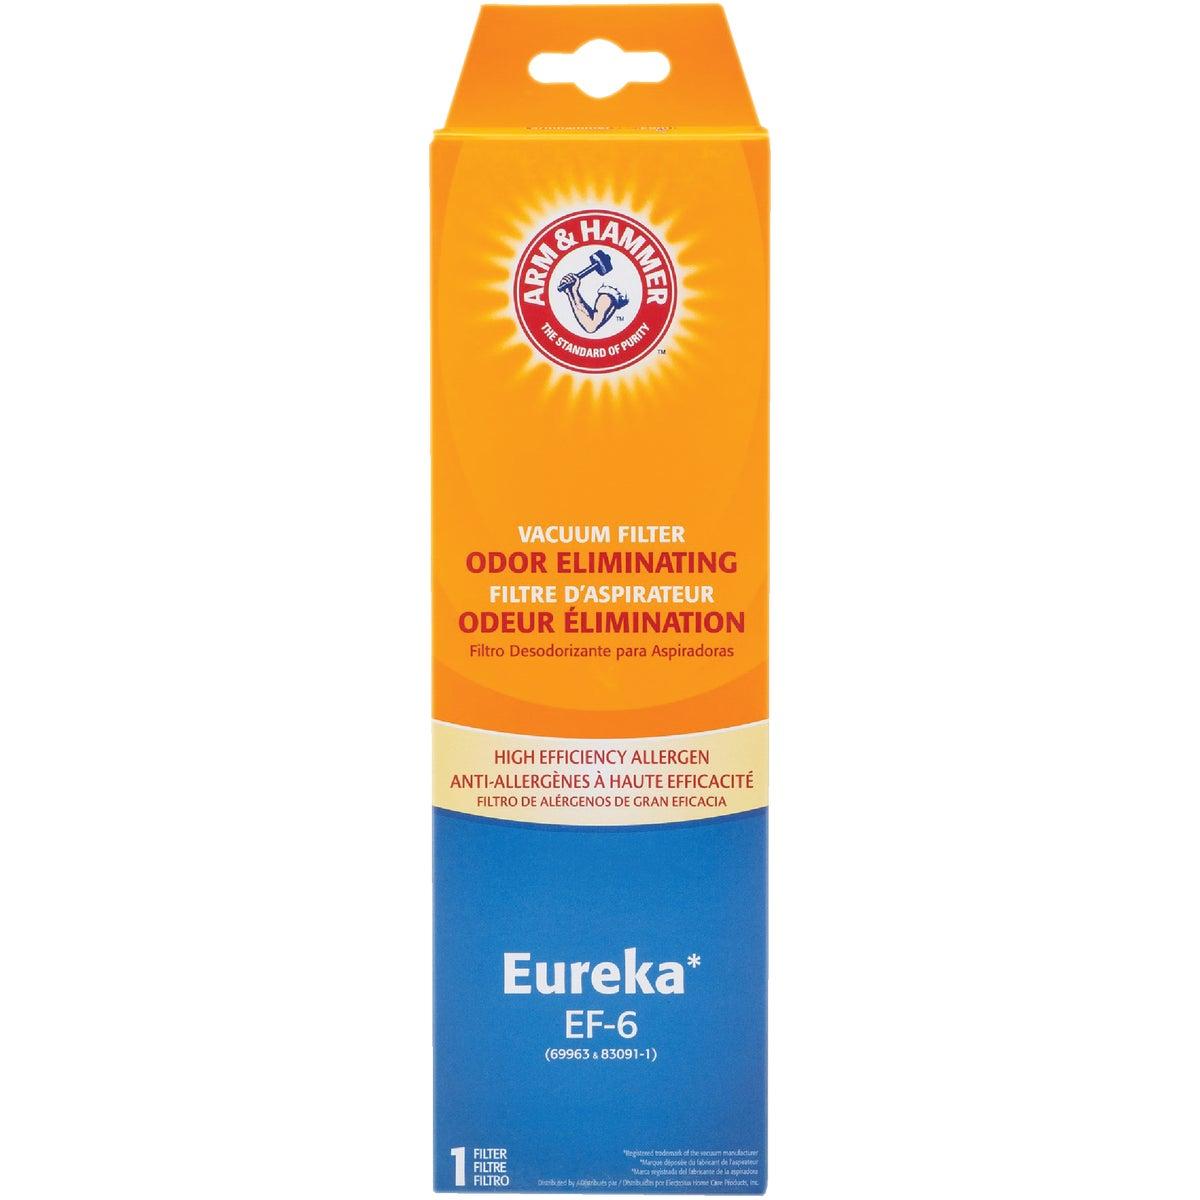 Filtrete Eureka EF-6 Filter, 67826-4